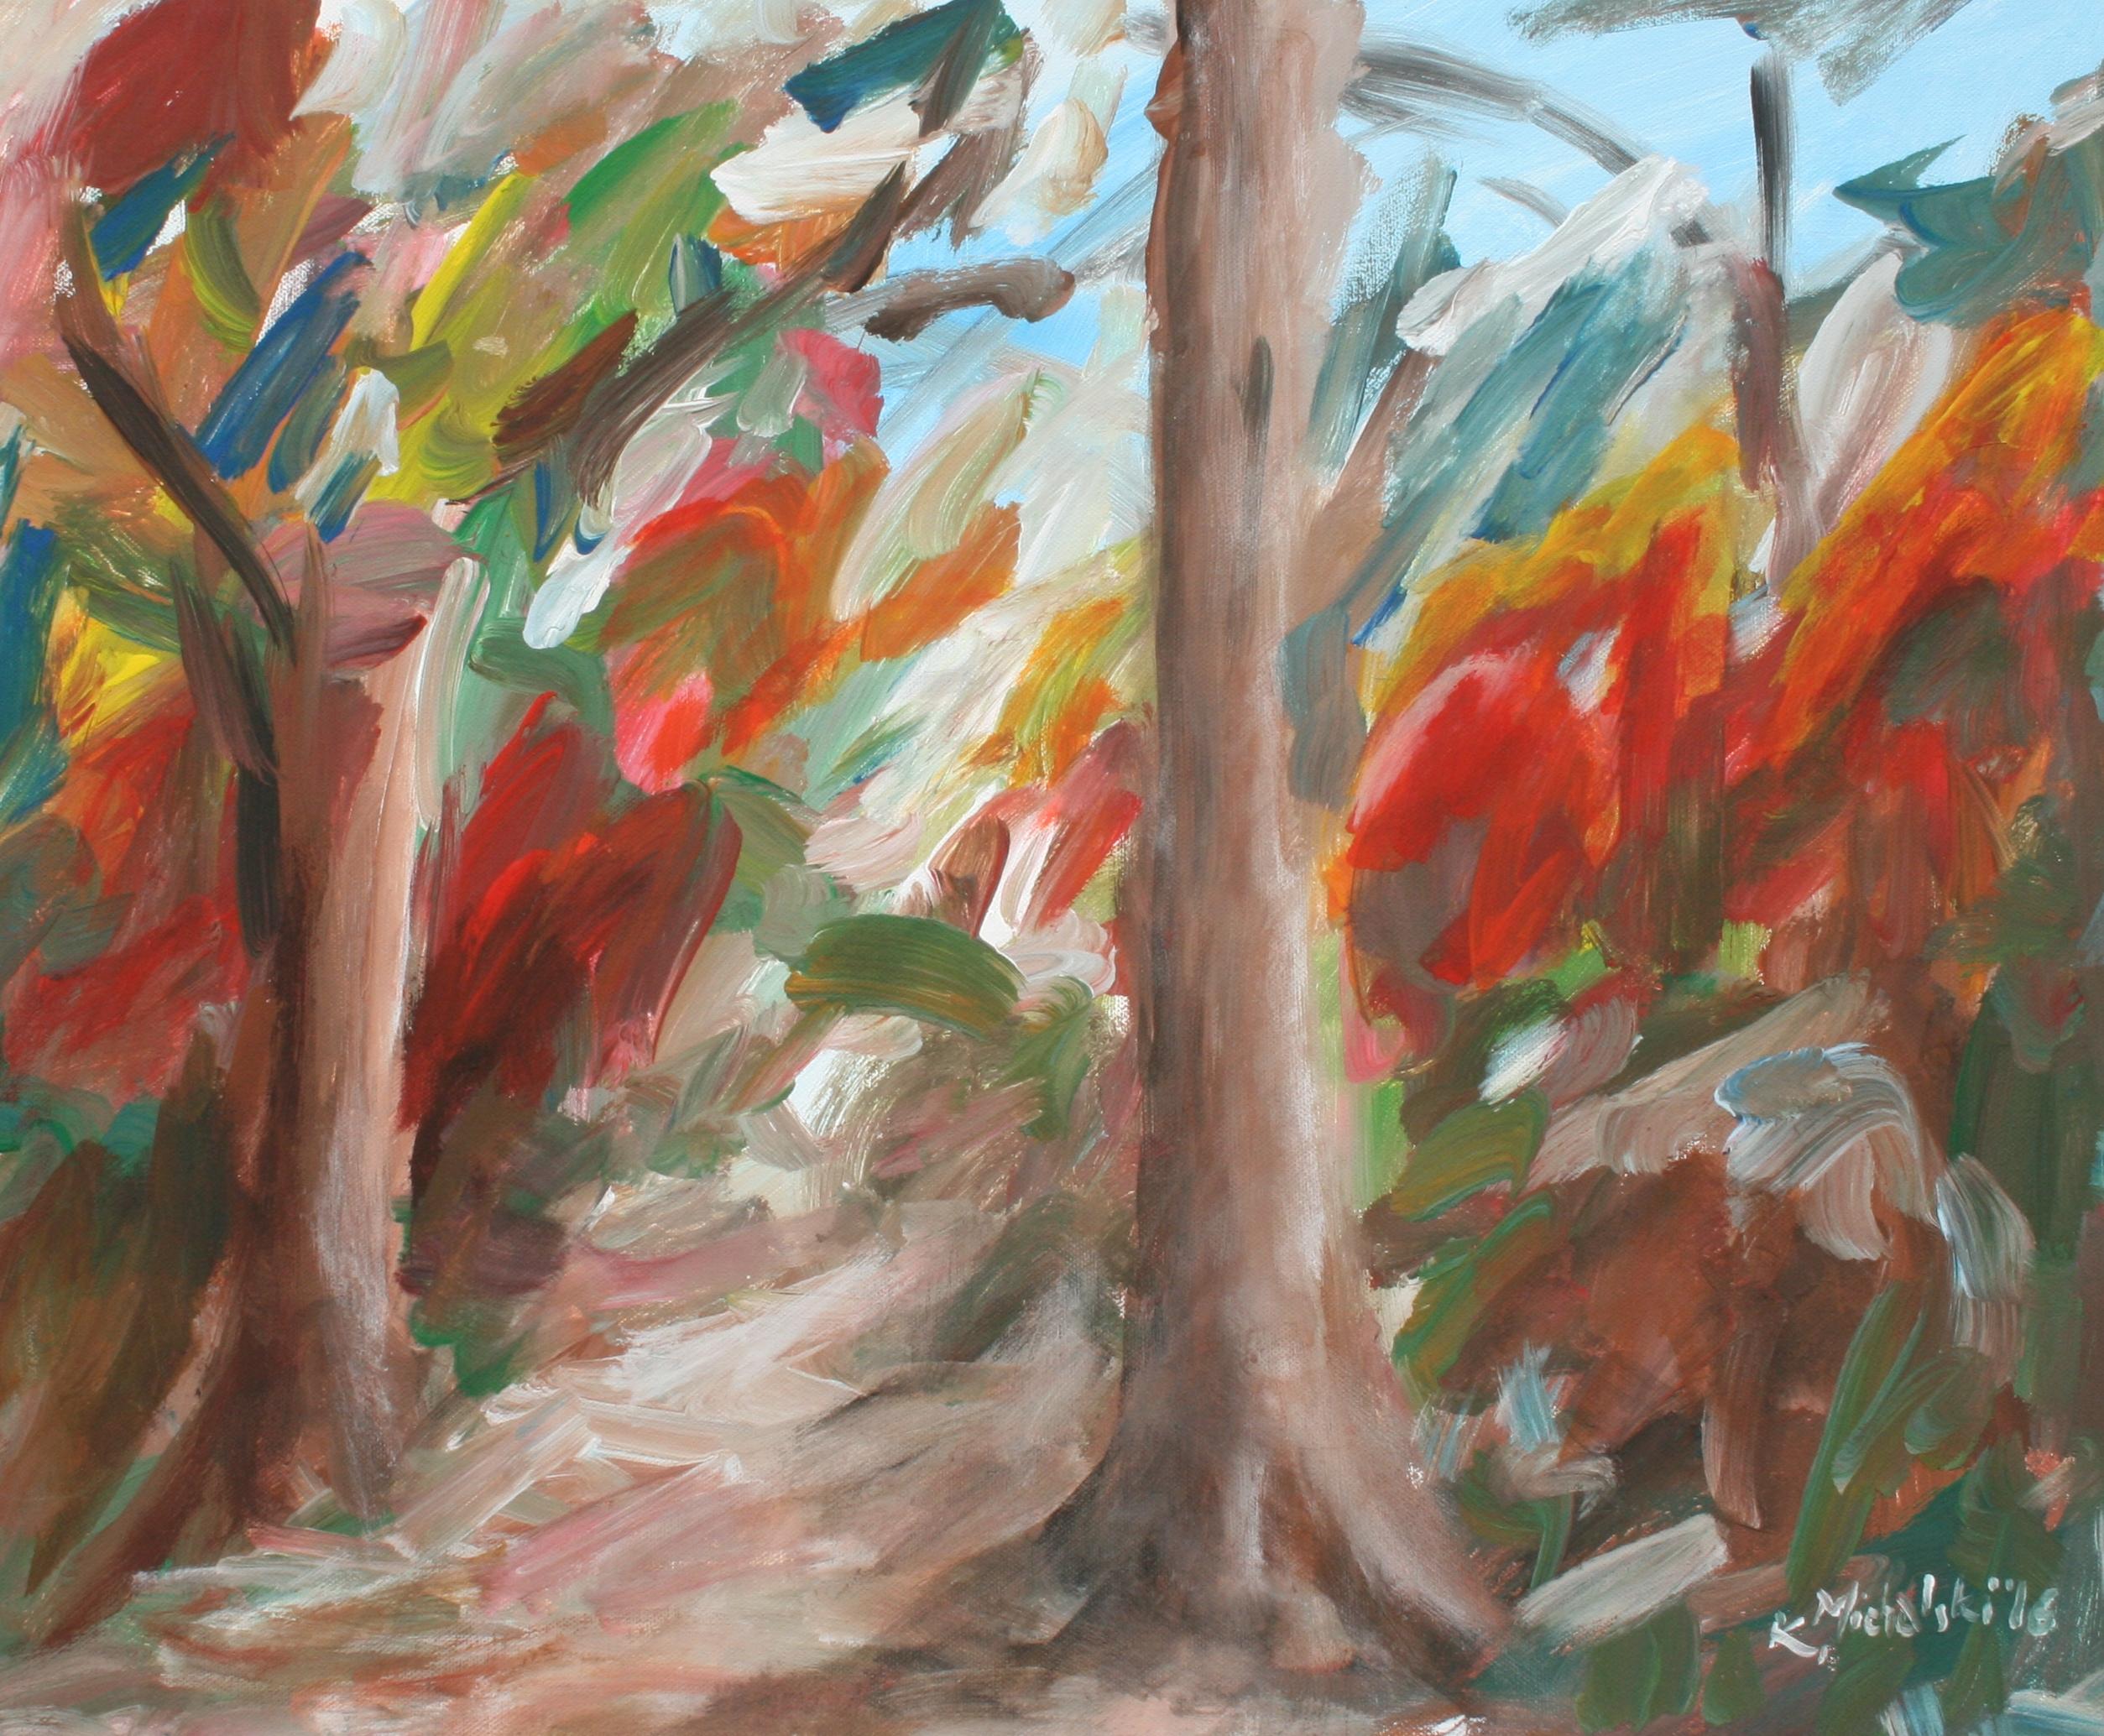 Herbstwald, 2016, 50 x 60, Acryl auf Leinwand